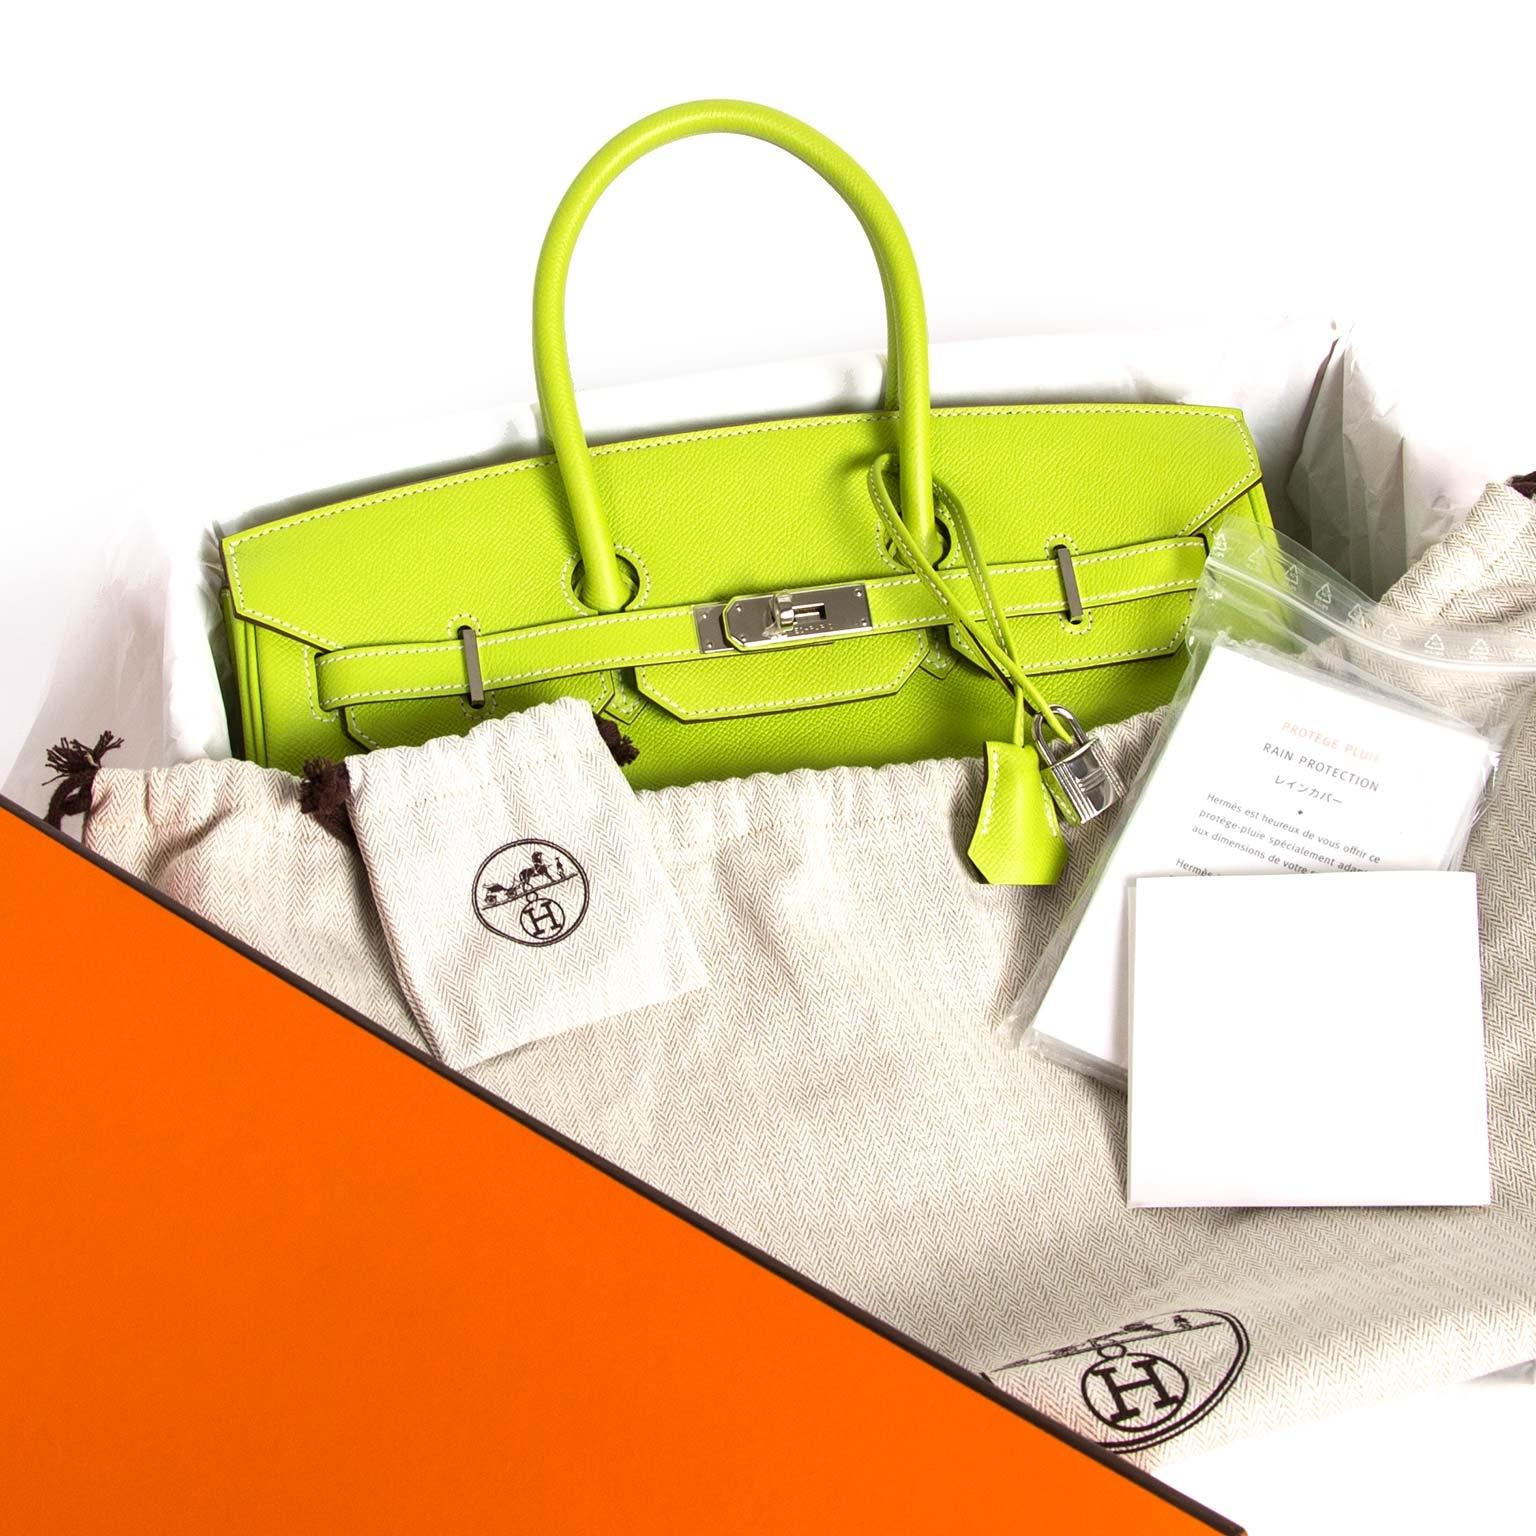 looking for a Hermès Birkin 35